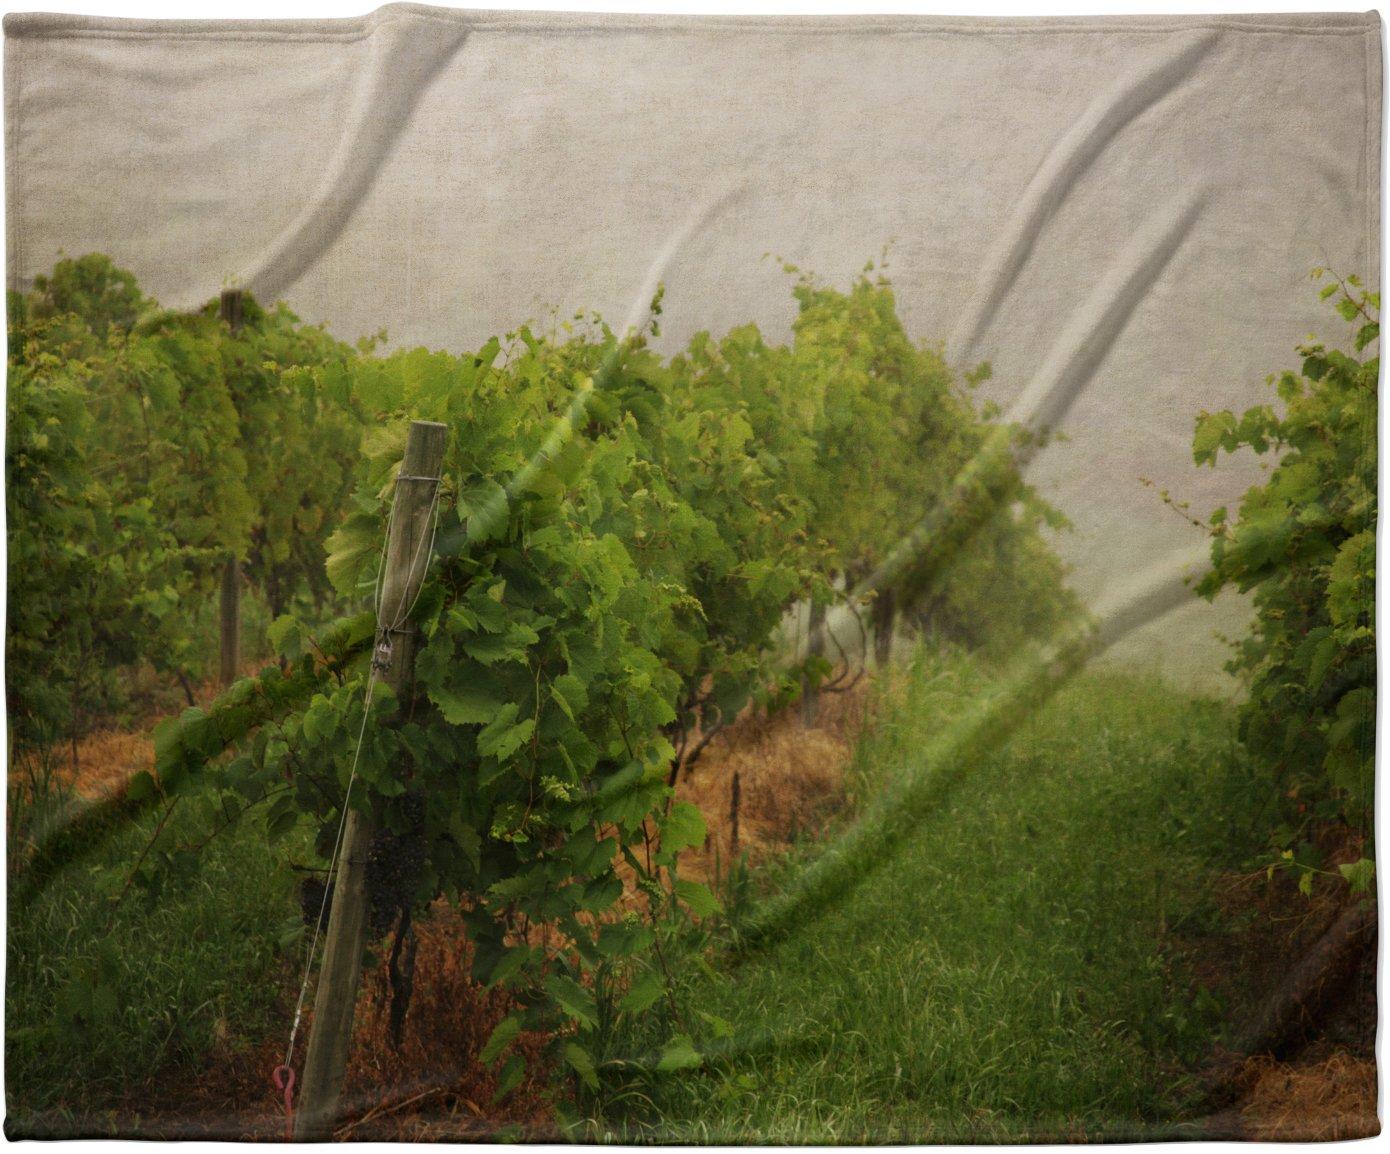 KESS InHouse Angie Turner 'Grape Vines' Foggy Fleece Baby Blanket, 40' x 30'